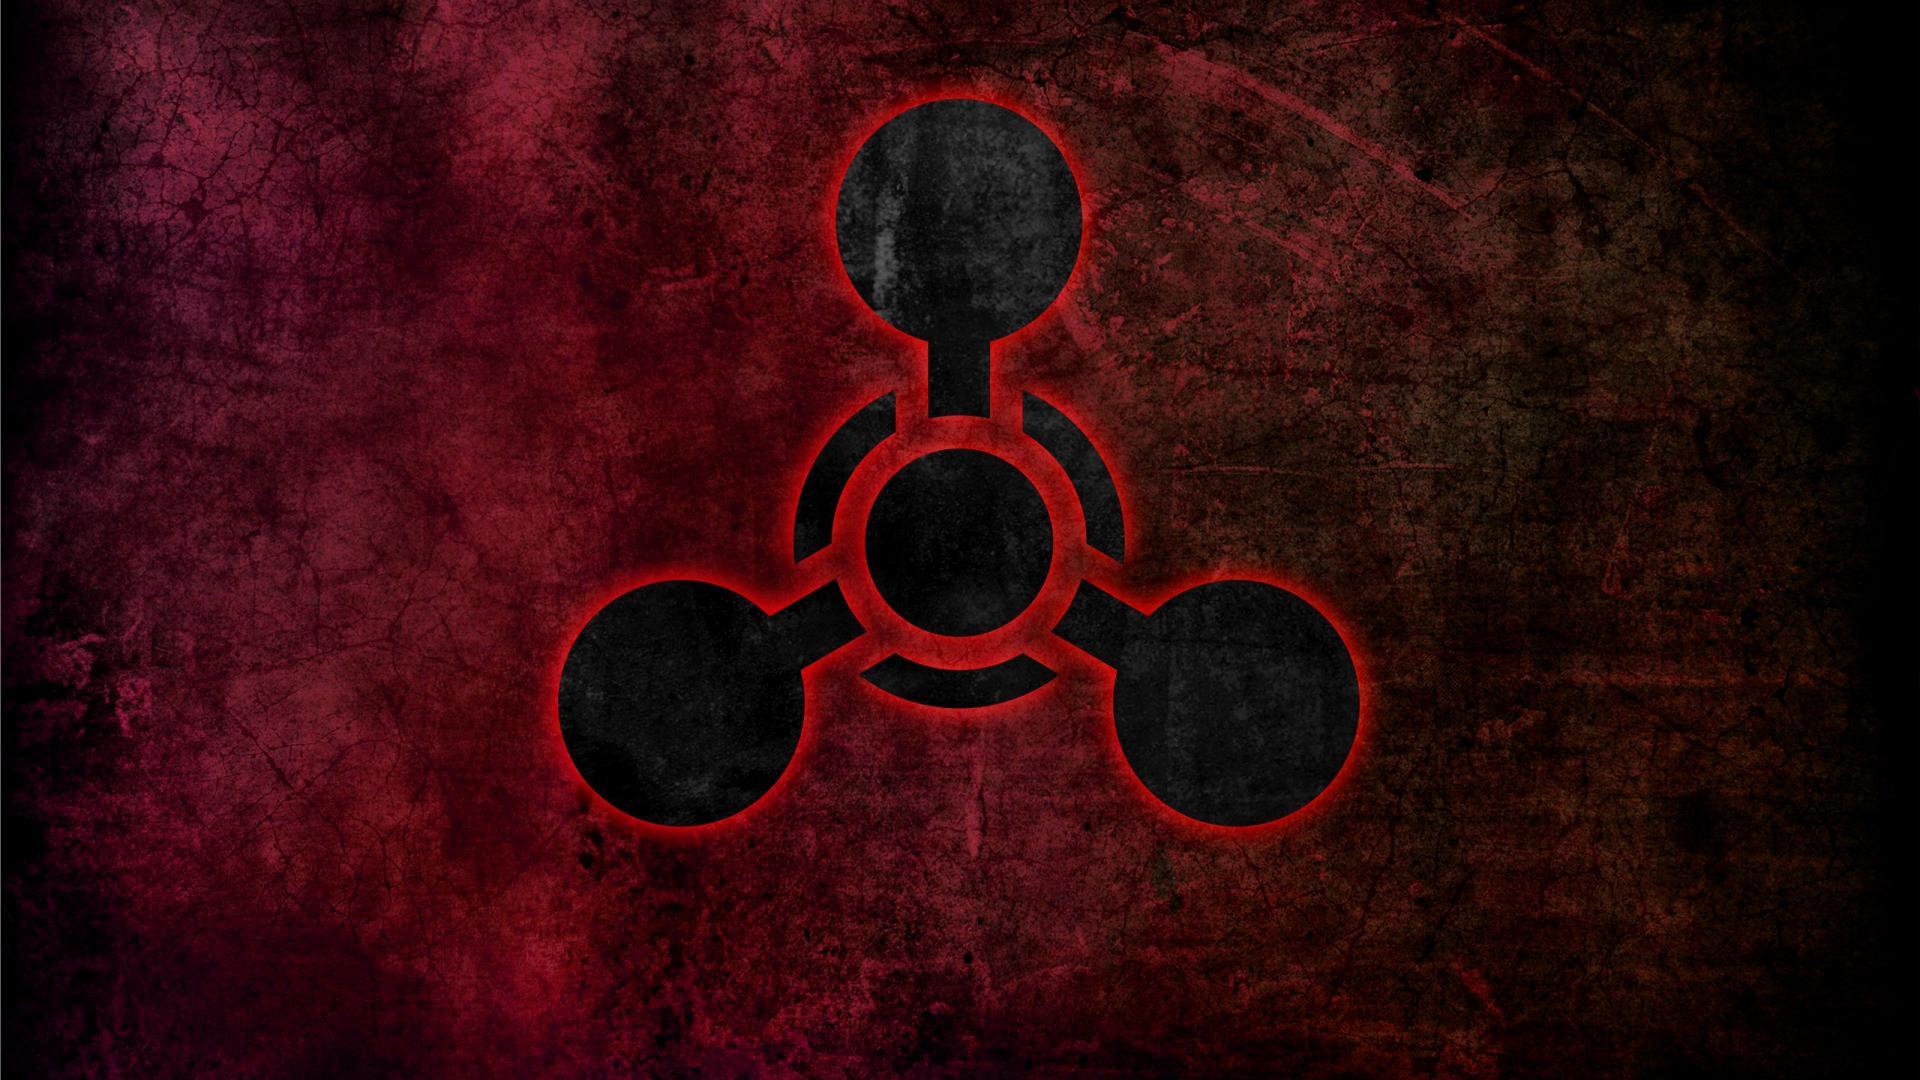 primera guerra mundial-i guerra mundial-el ataque de los hombres muertos-sabaton-musica-power metal-attack of the dead men-rusia-alemania-osowiec-polonia-quimica-armas quimicas